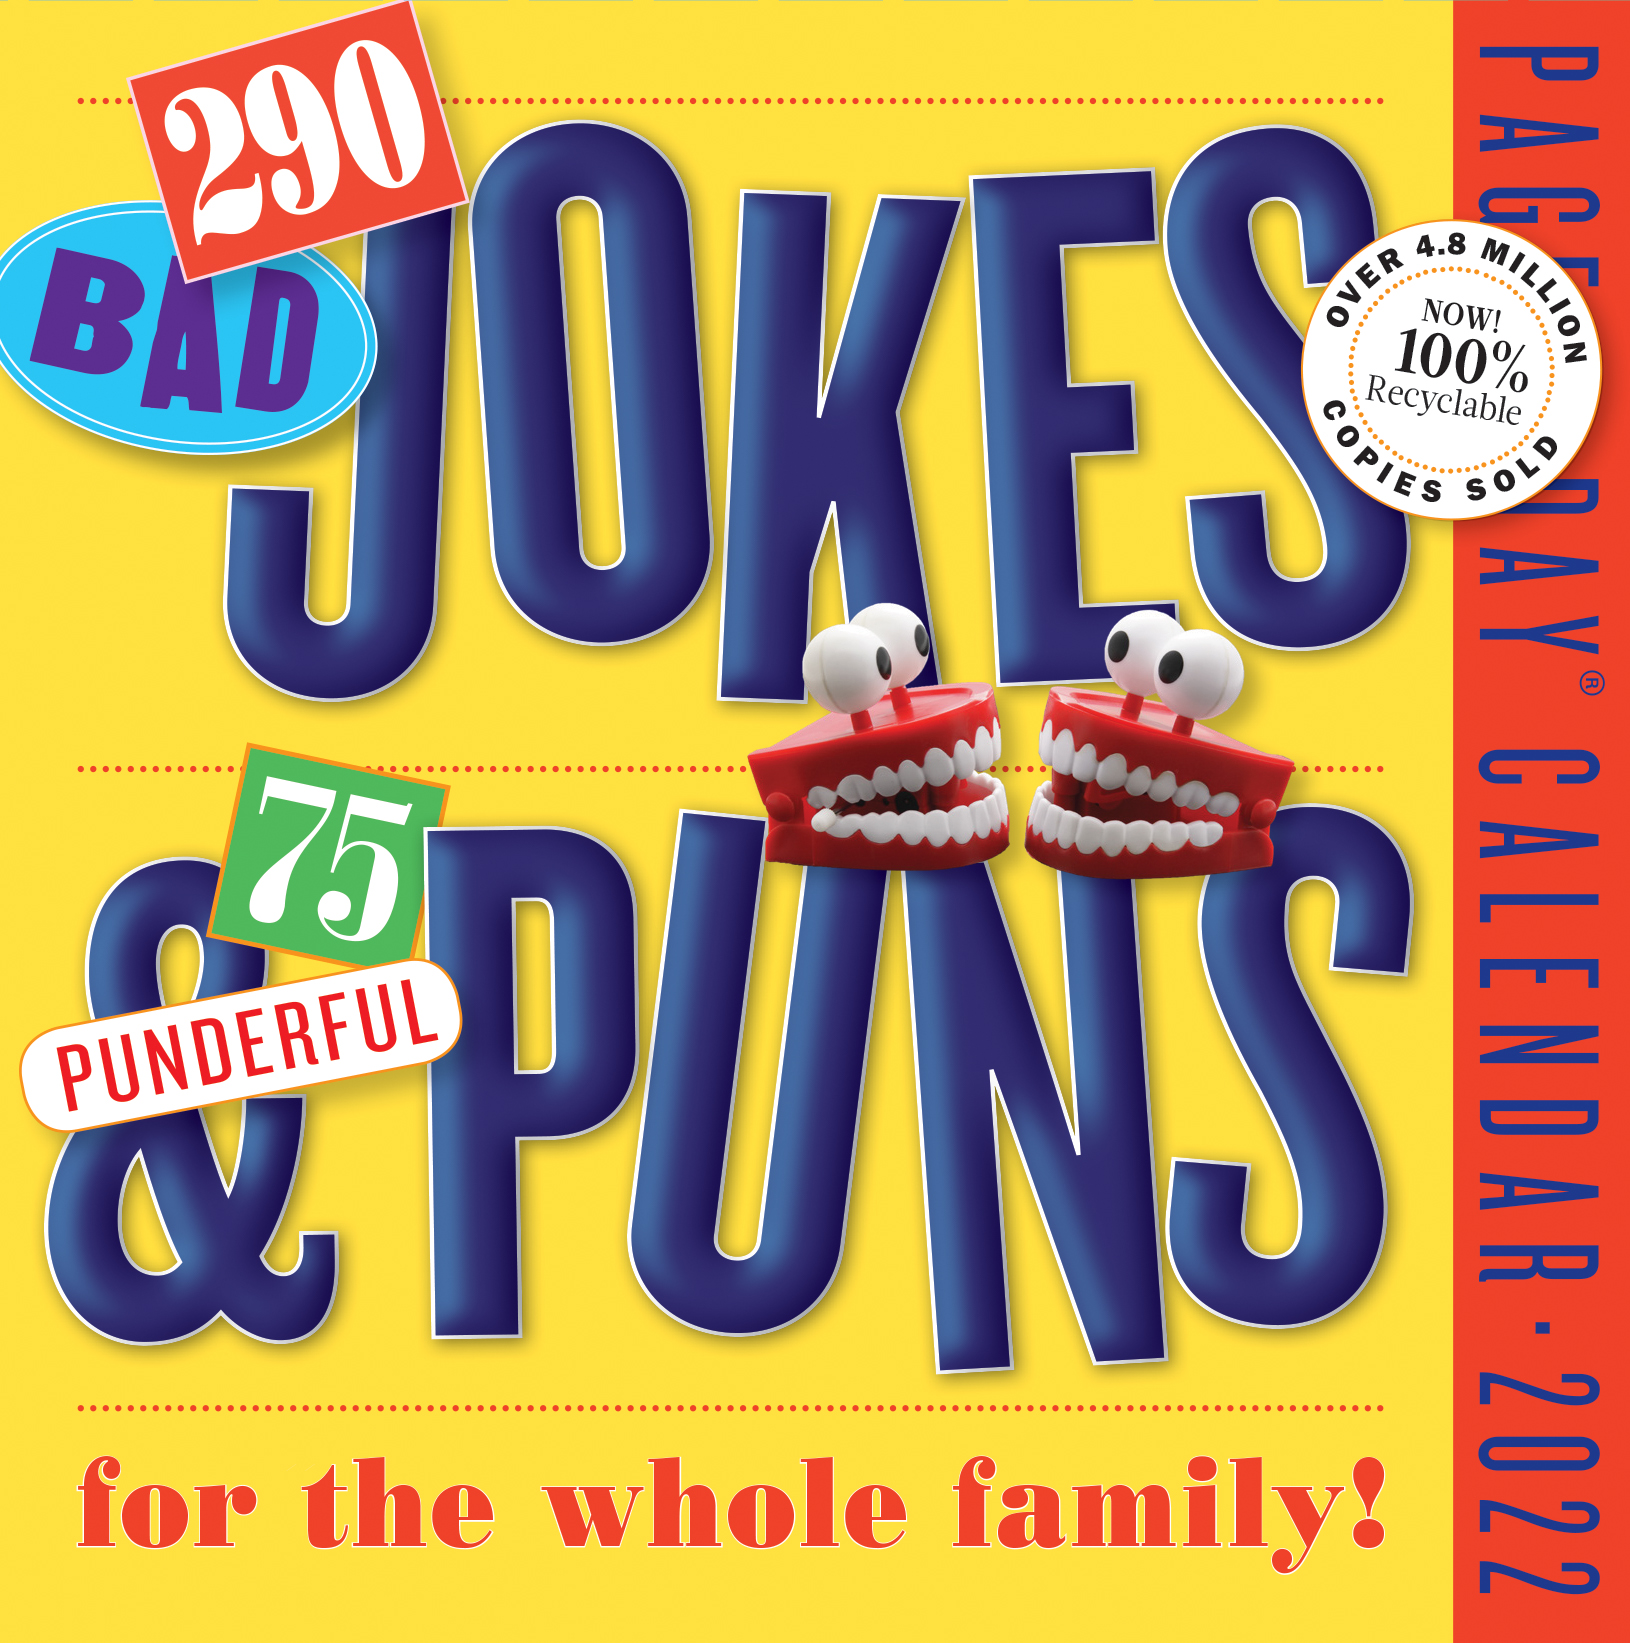 290 Bad Jokes & 75 Punderful Puns Page-A-Day Calendar 2022